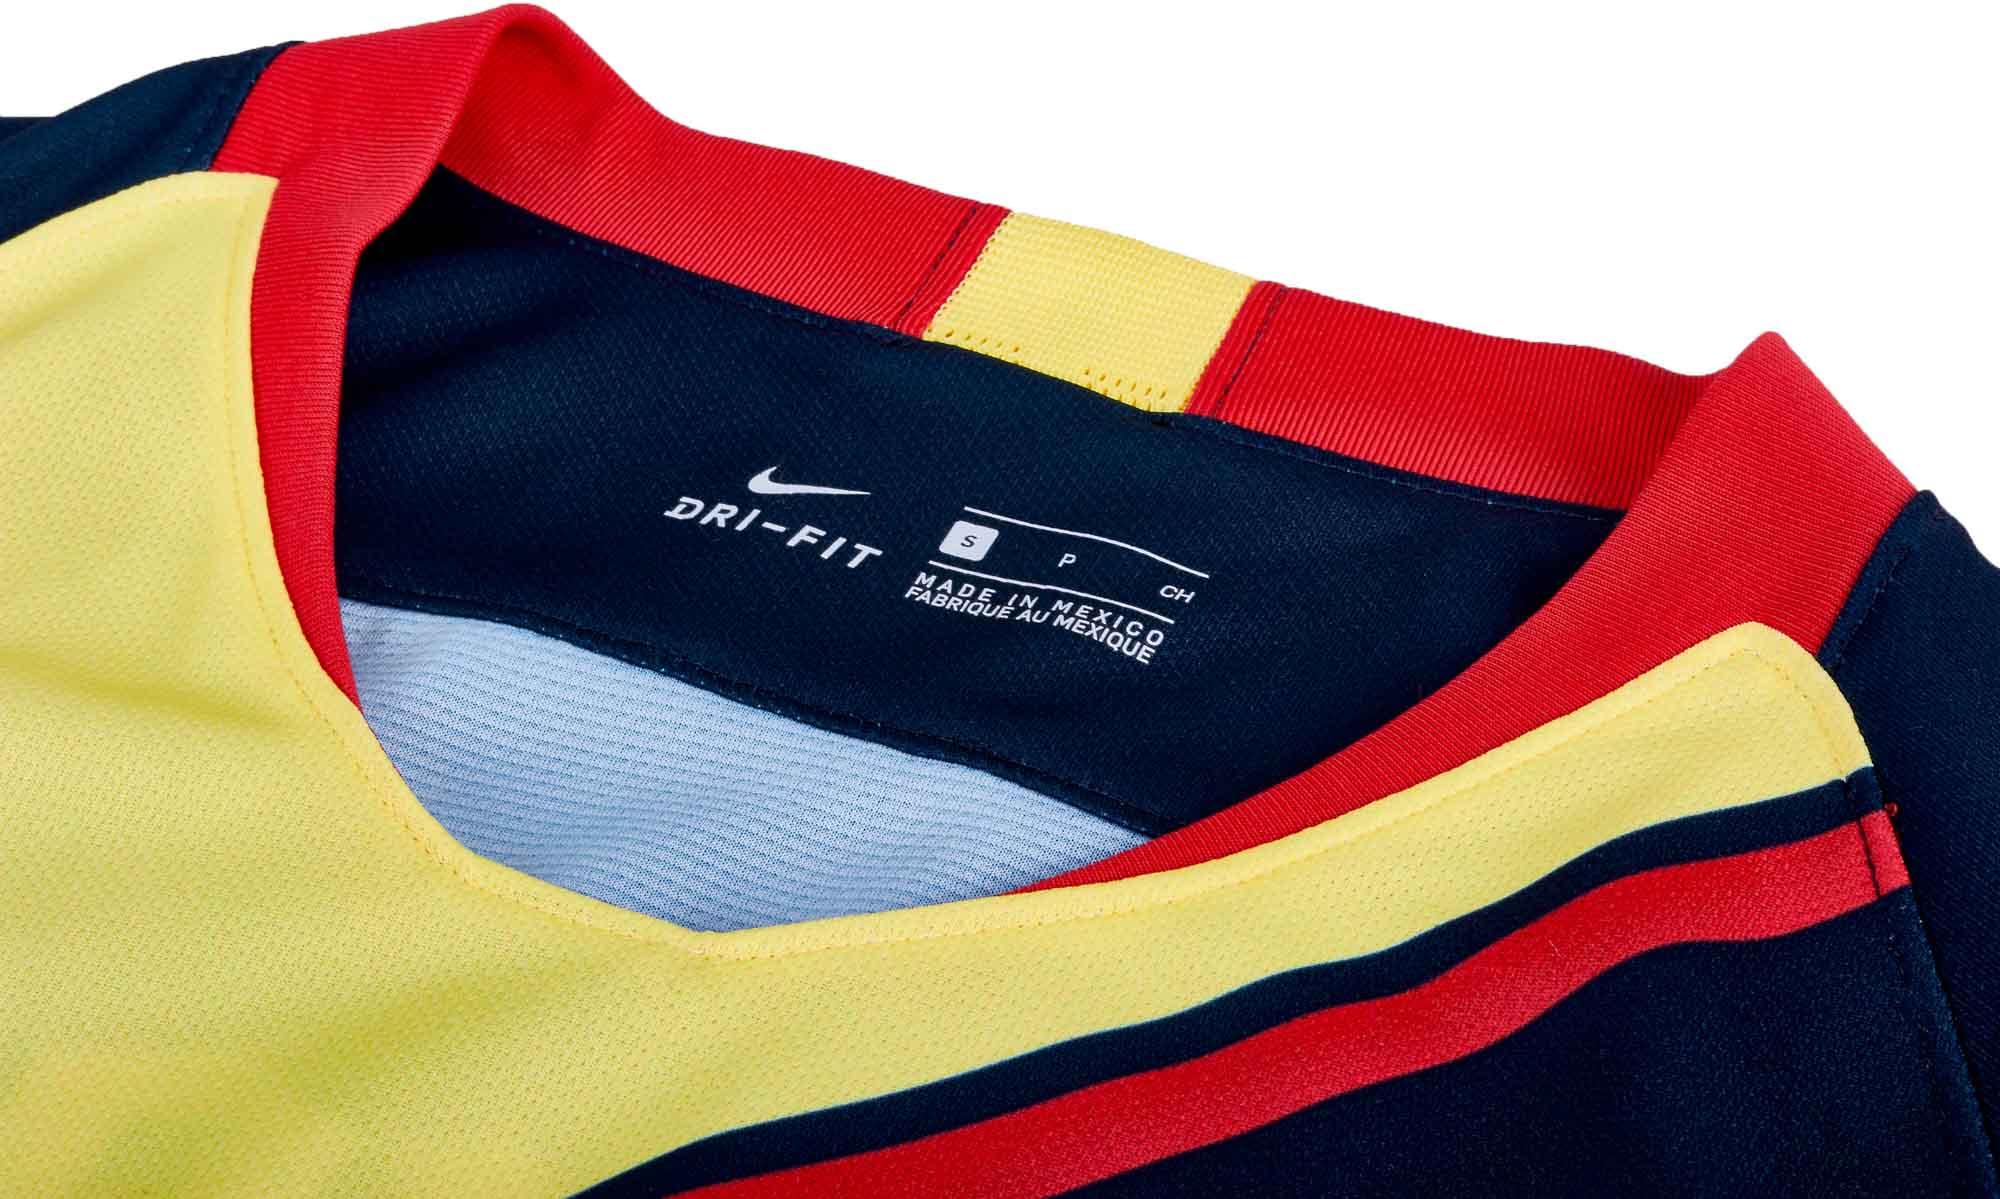 low priced ec6e8 b7bab Nike Club America Away Jersey - Armory Navy/Gym Red - SoccerPro